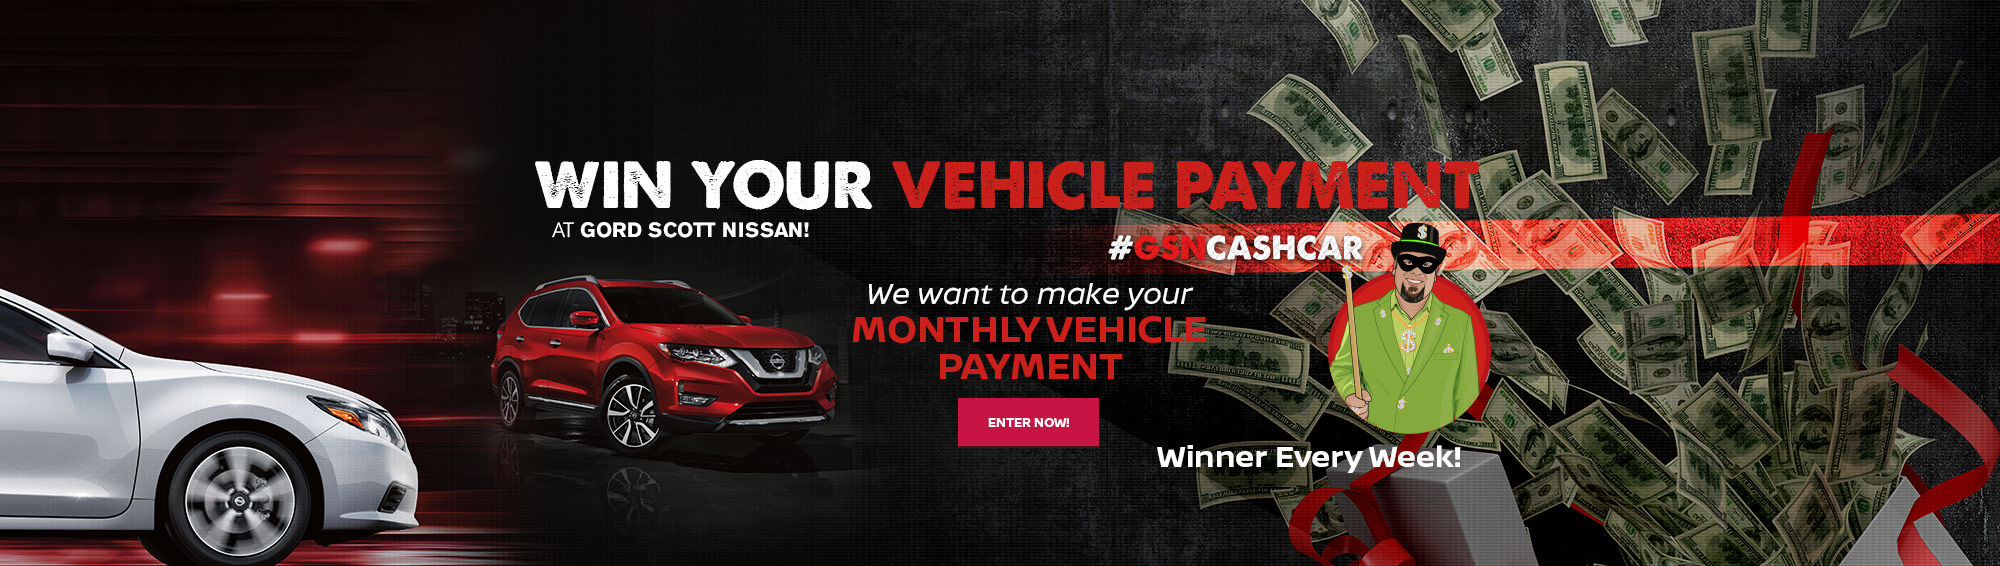 Cash Car Contest!